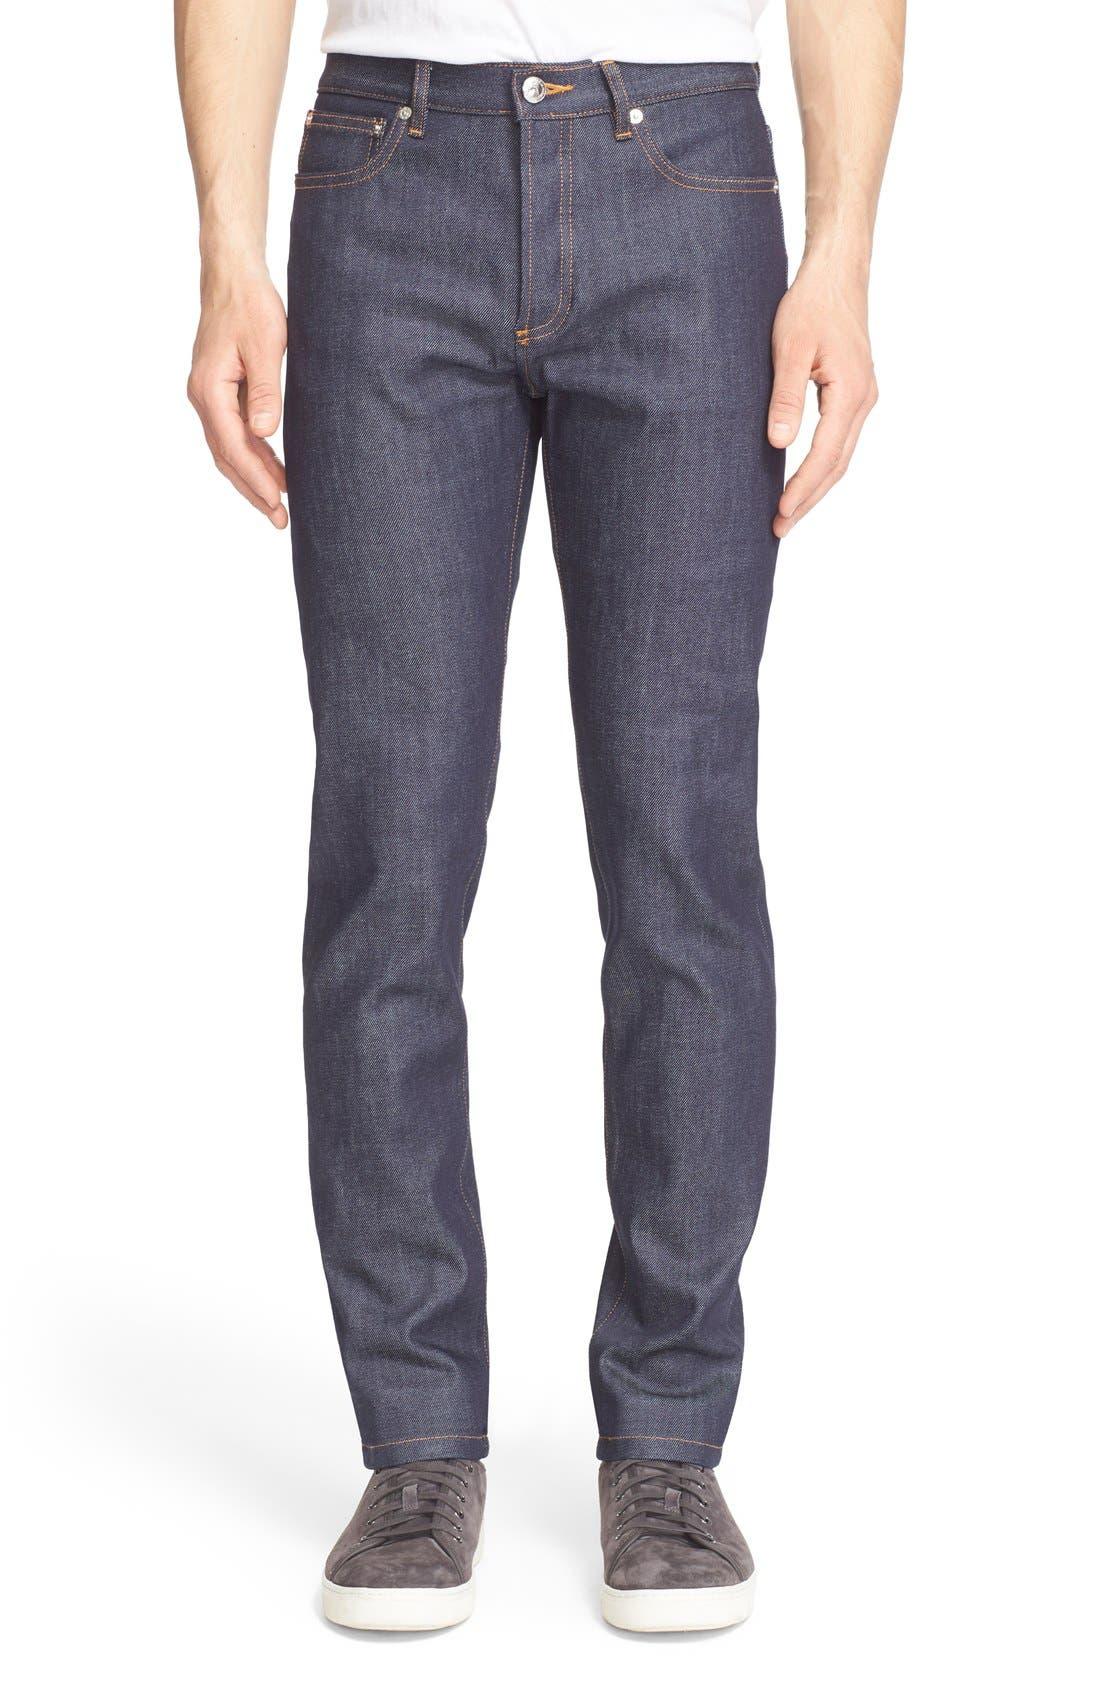 Main Image - A.P.C. 'Petite New Standard' Skinny Fit Jeans (Indigo)